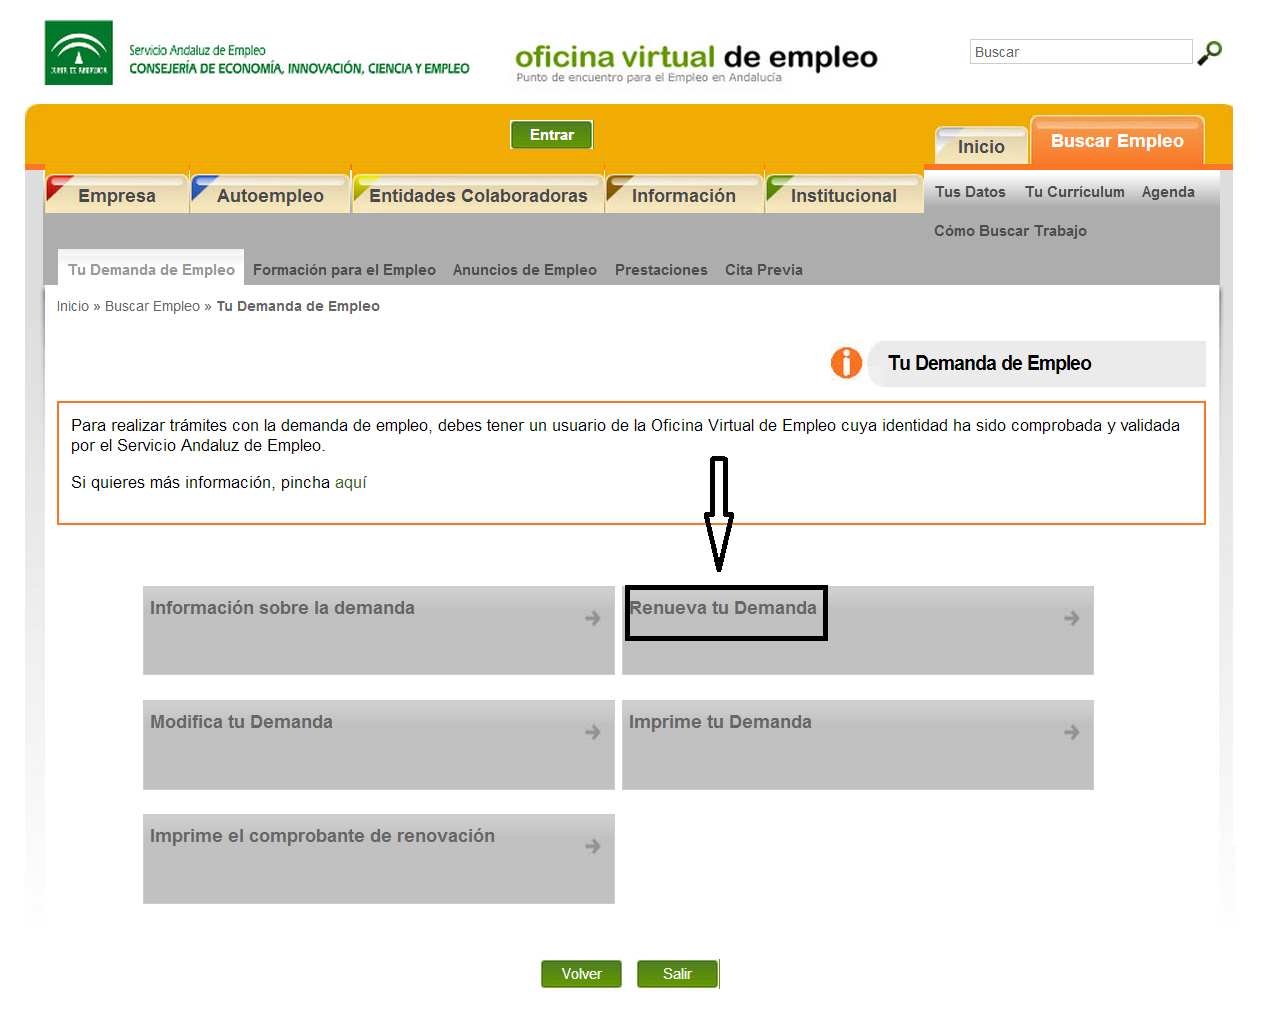 Tecnoinfe tecnolog a inform tica y educaci n pasos a for Oficina virtual empleo